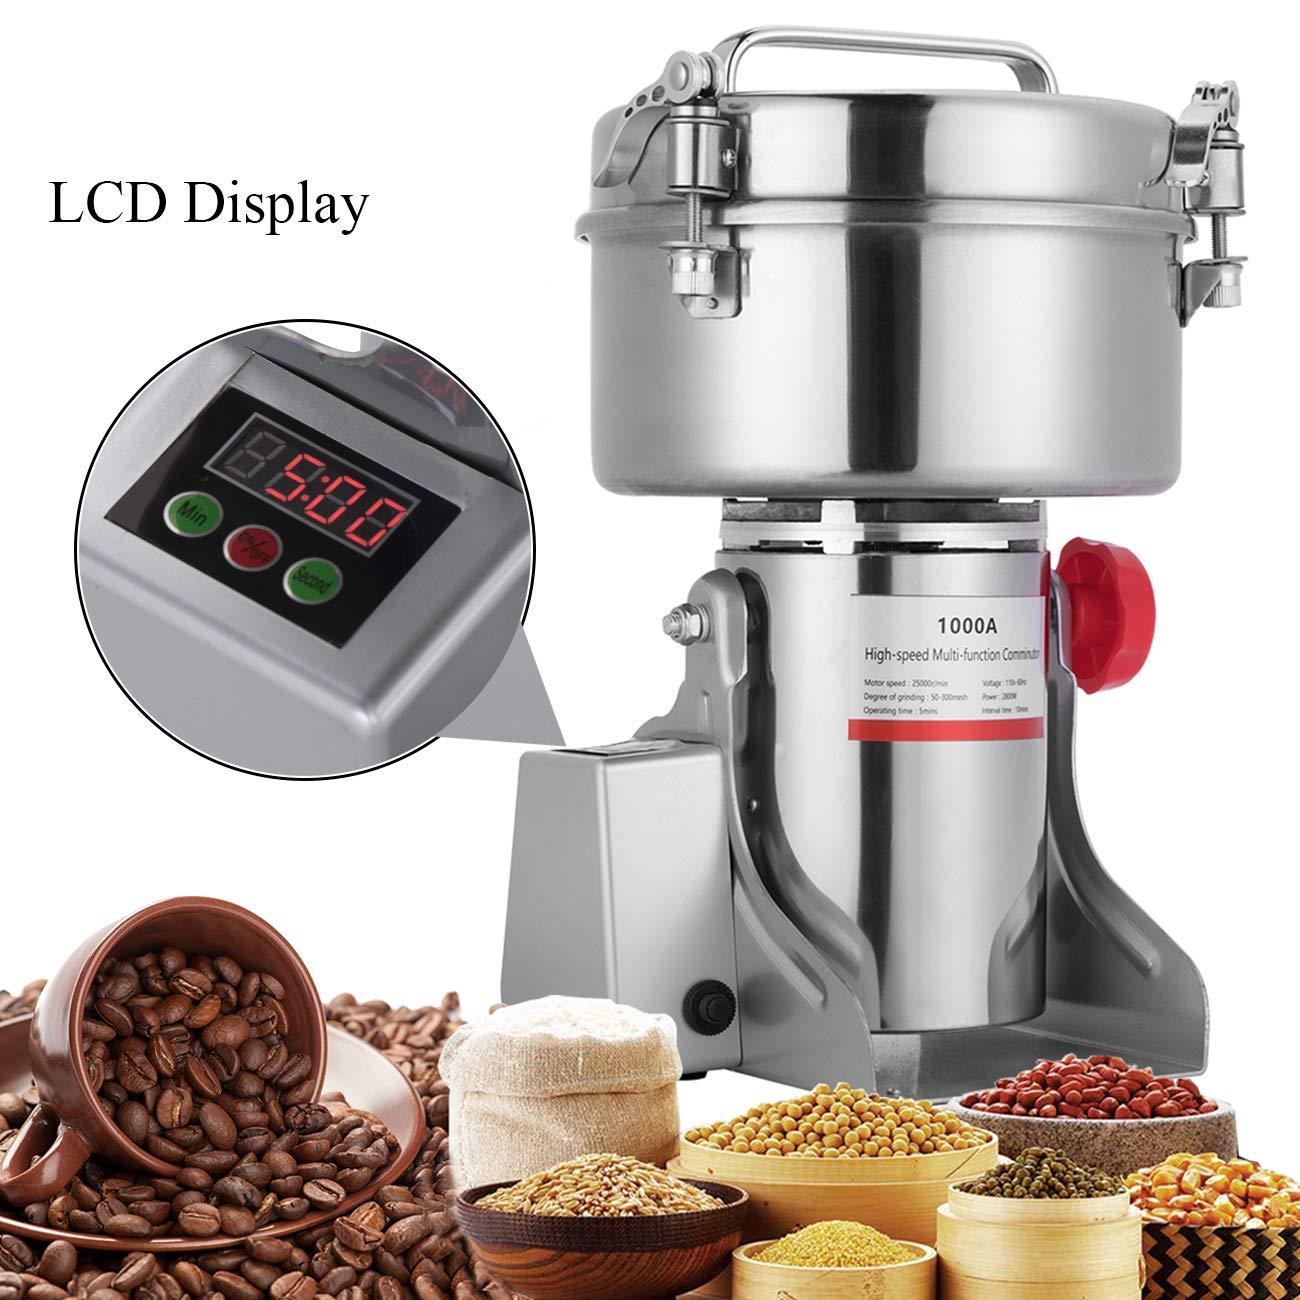 APWONE 1000G Electric Grain Mills Grinder Powder LCD Digital Stainless Steel Ultra Grinder Machine Pulverizer for Kitchen Herb Spice Pepper Coffee Corn